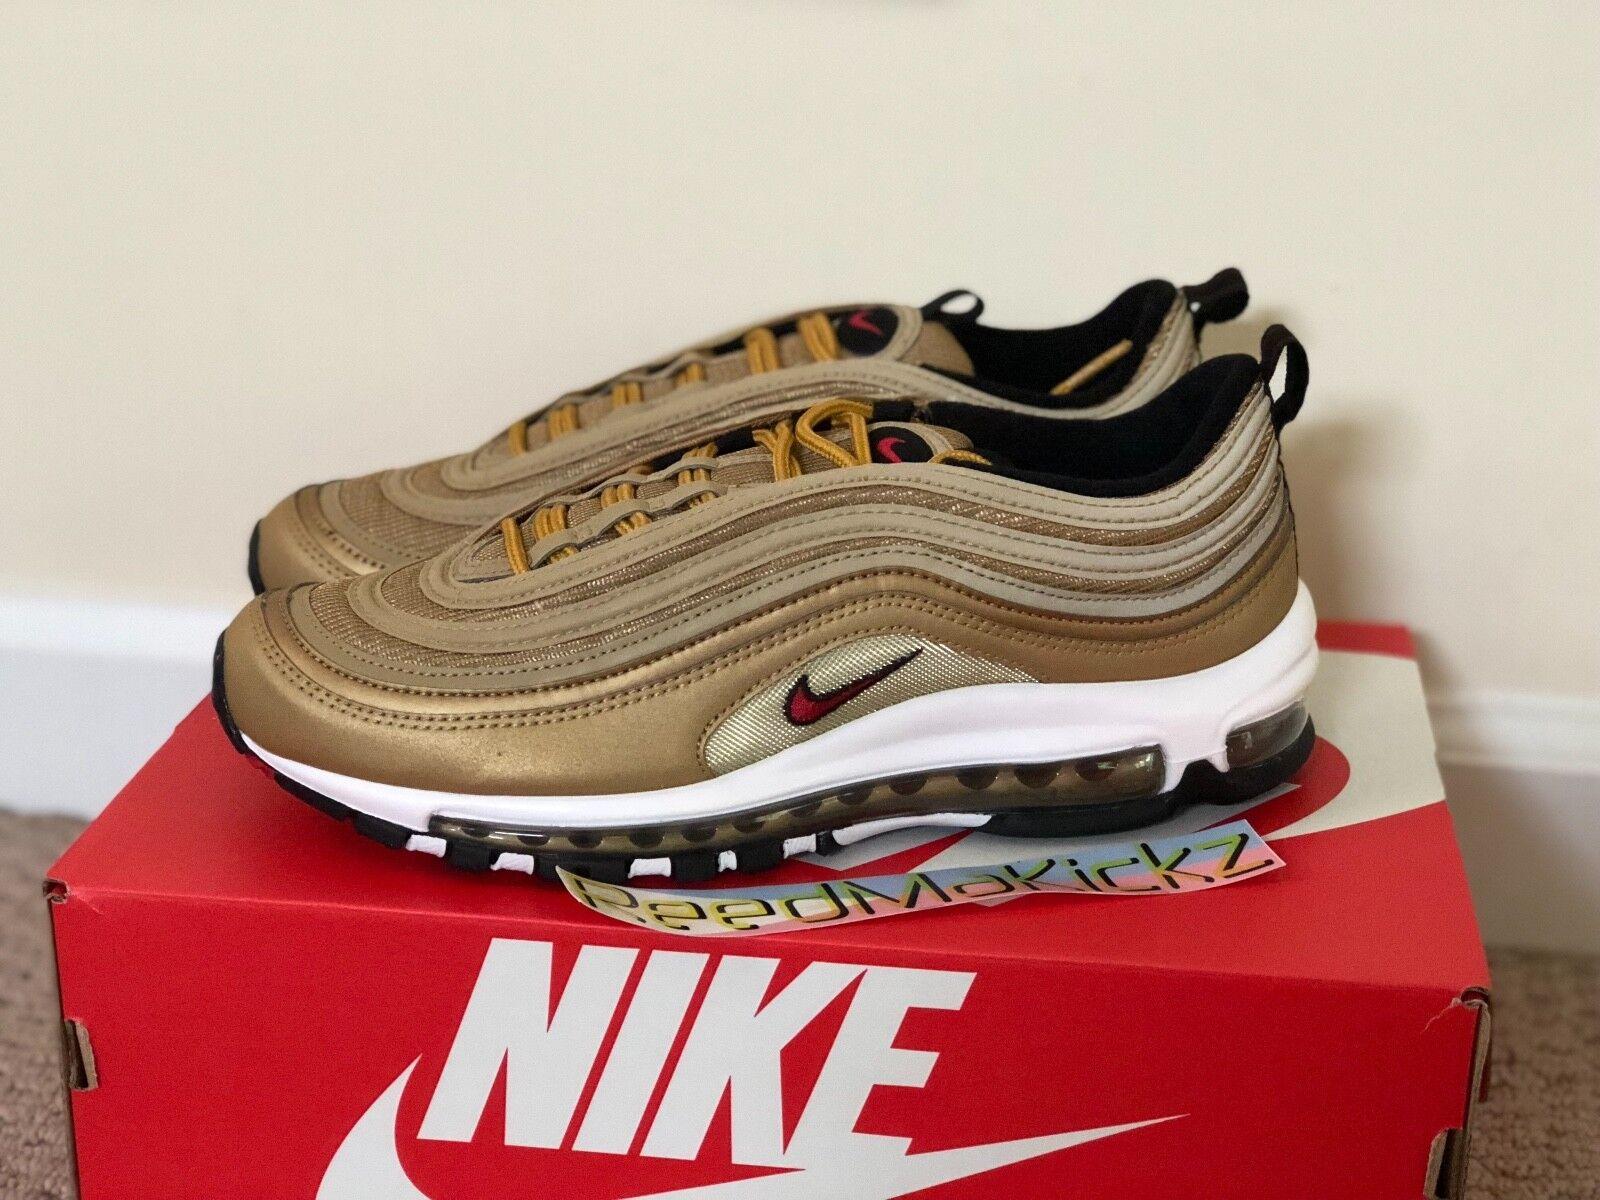 Nike Air Max 97 OG QS Metallic gold mens sizes 884421 700